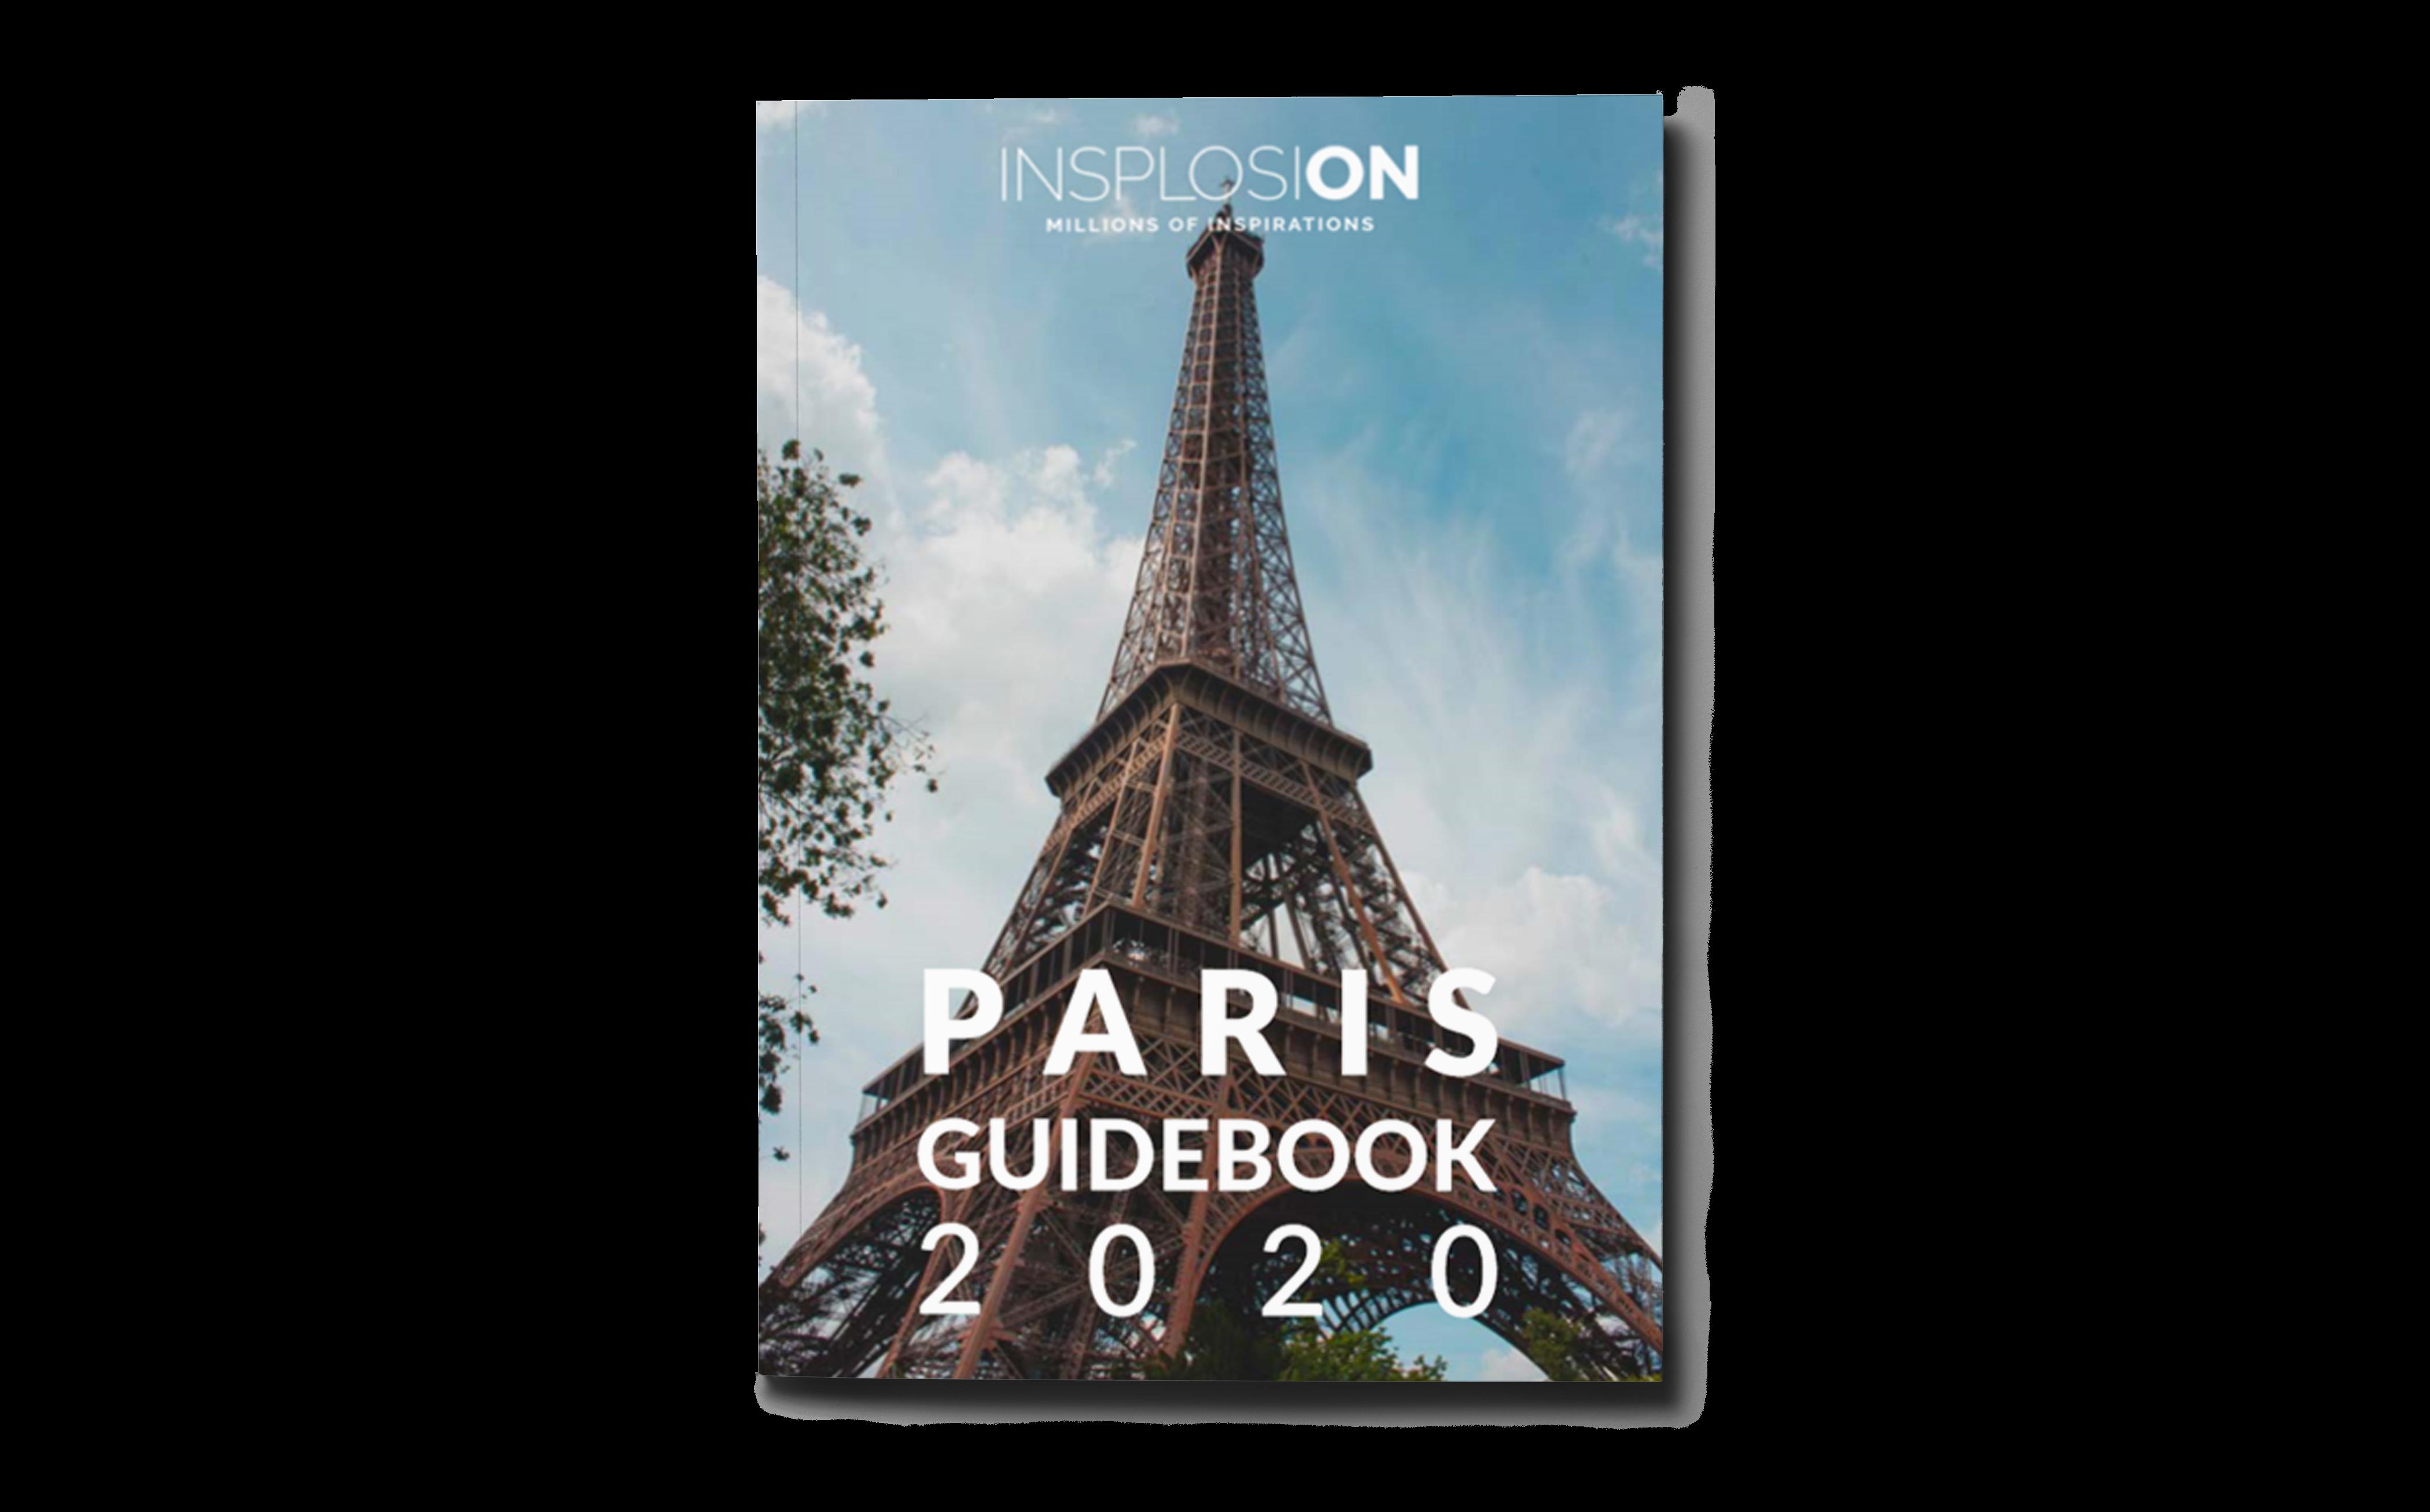 Paris Design Guide Book 2020 Free Download Insplosion